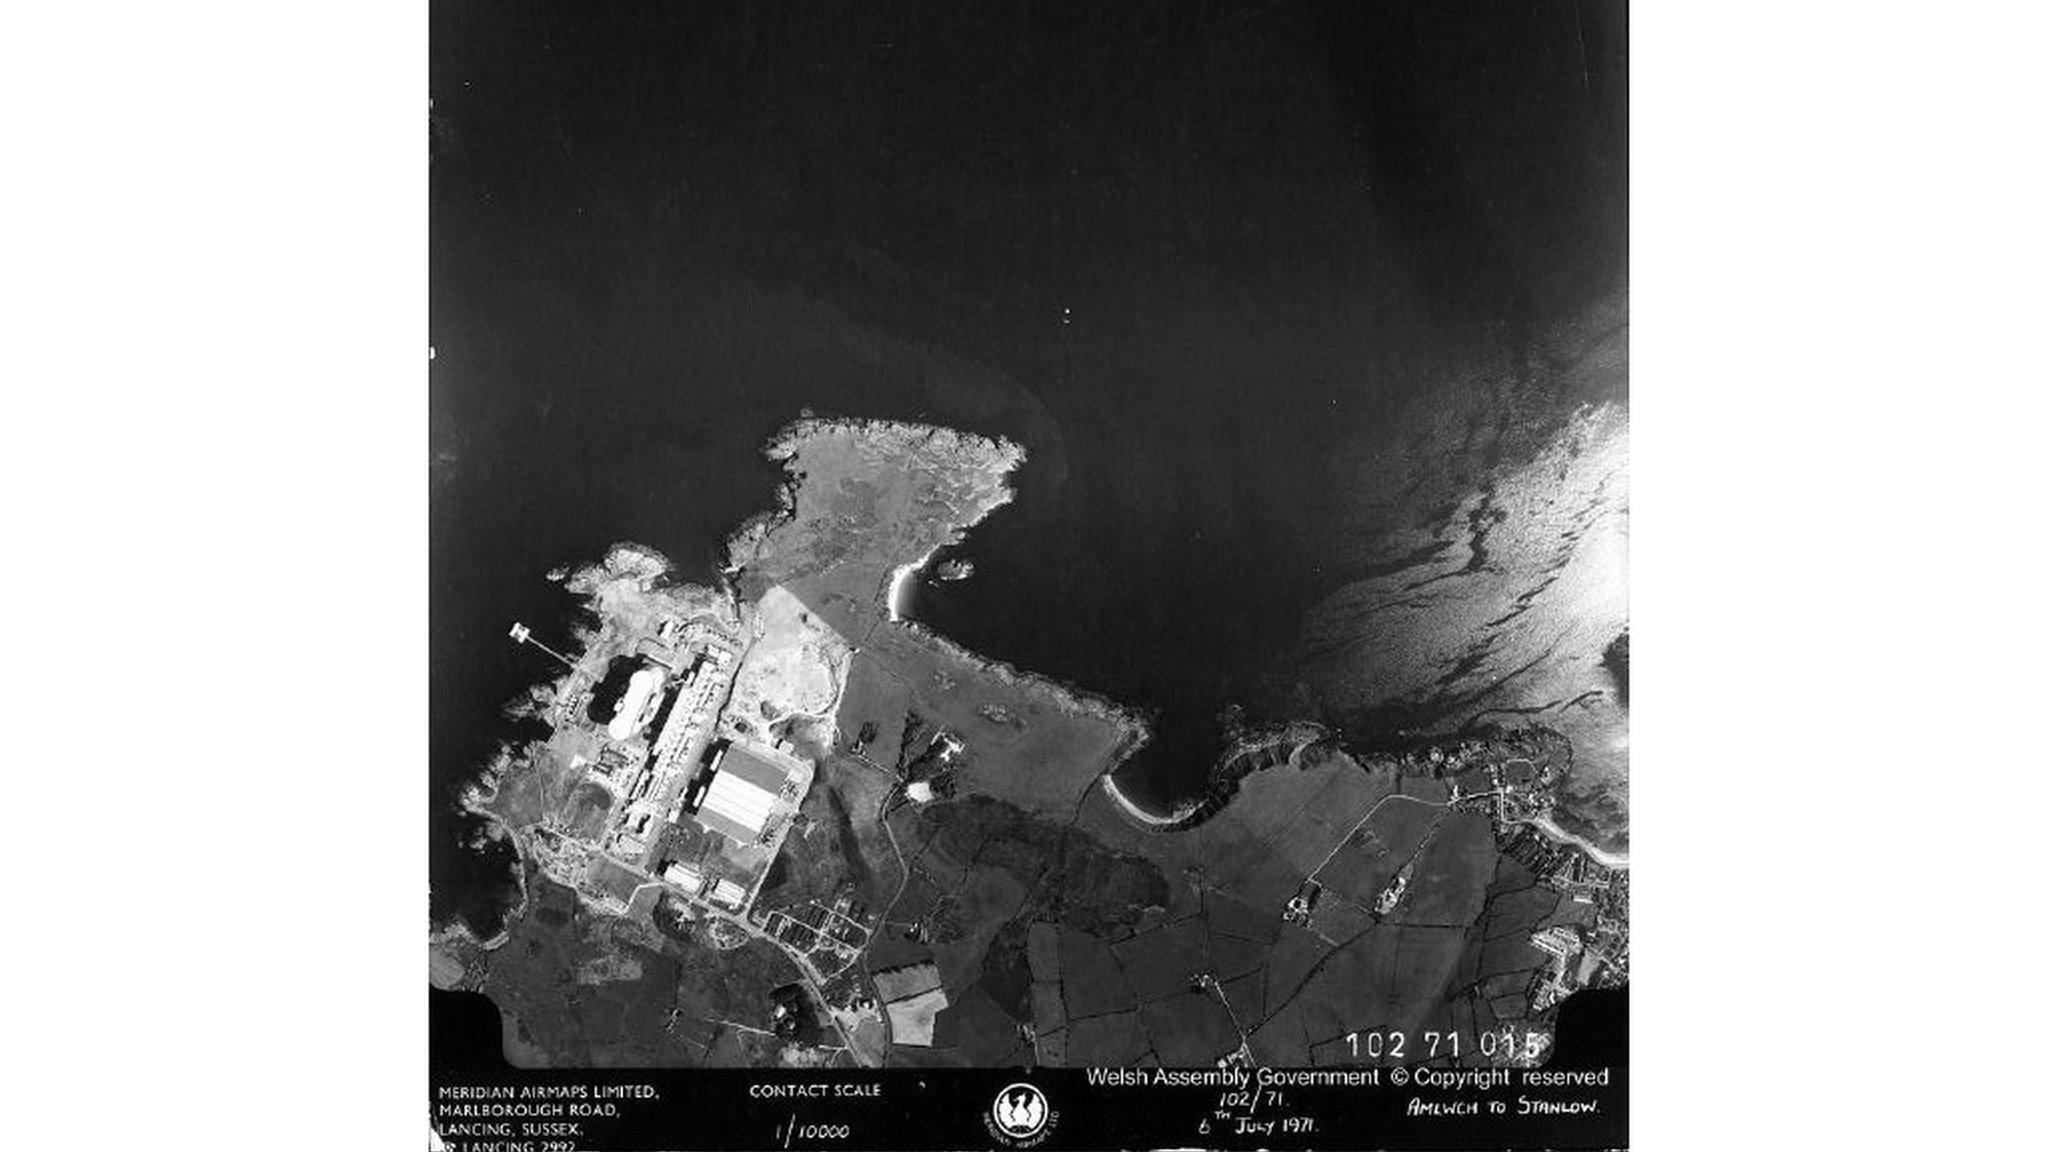 Golwg o'r awyr ar y safle yng ngogledd ddwyrain Ynys Môn // An official birds' eye view of the site almost on the north east tip of Anglesey